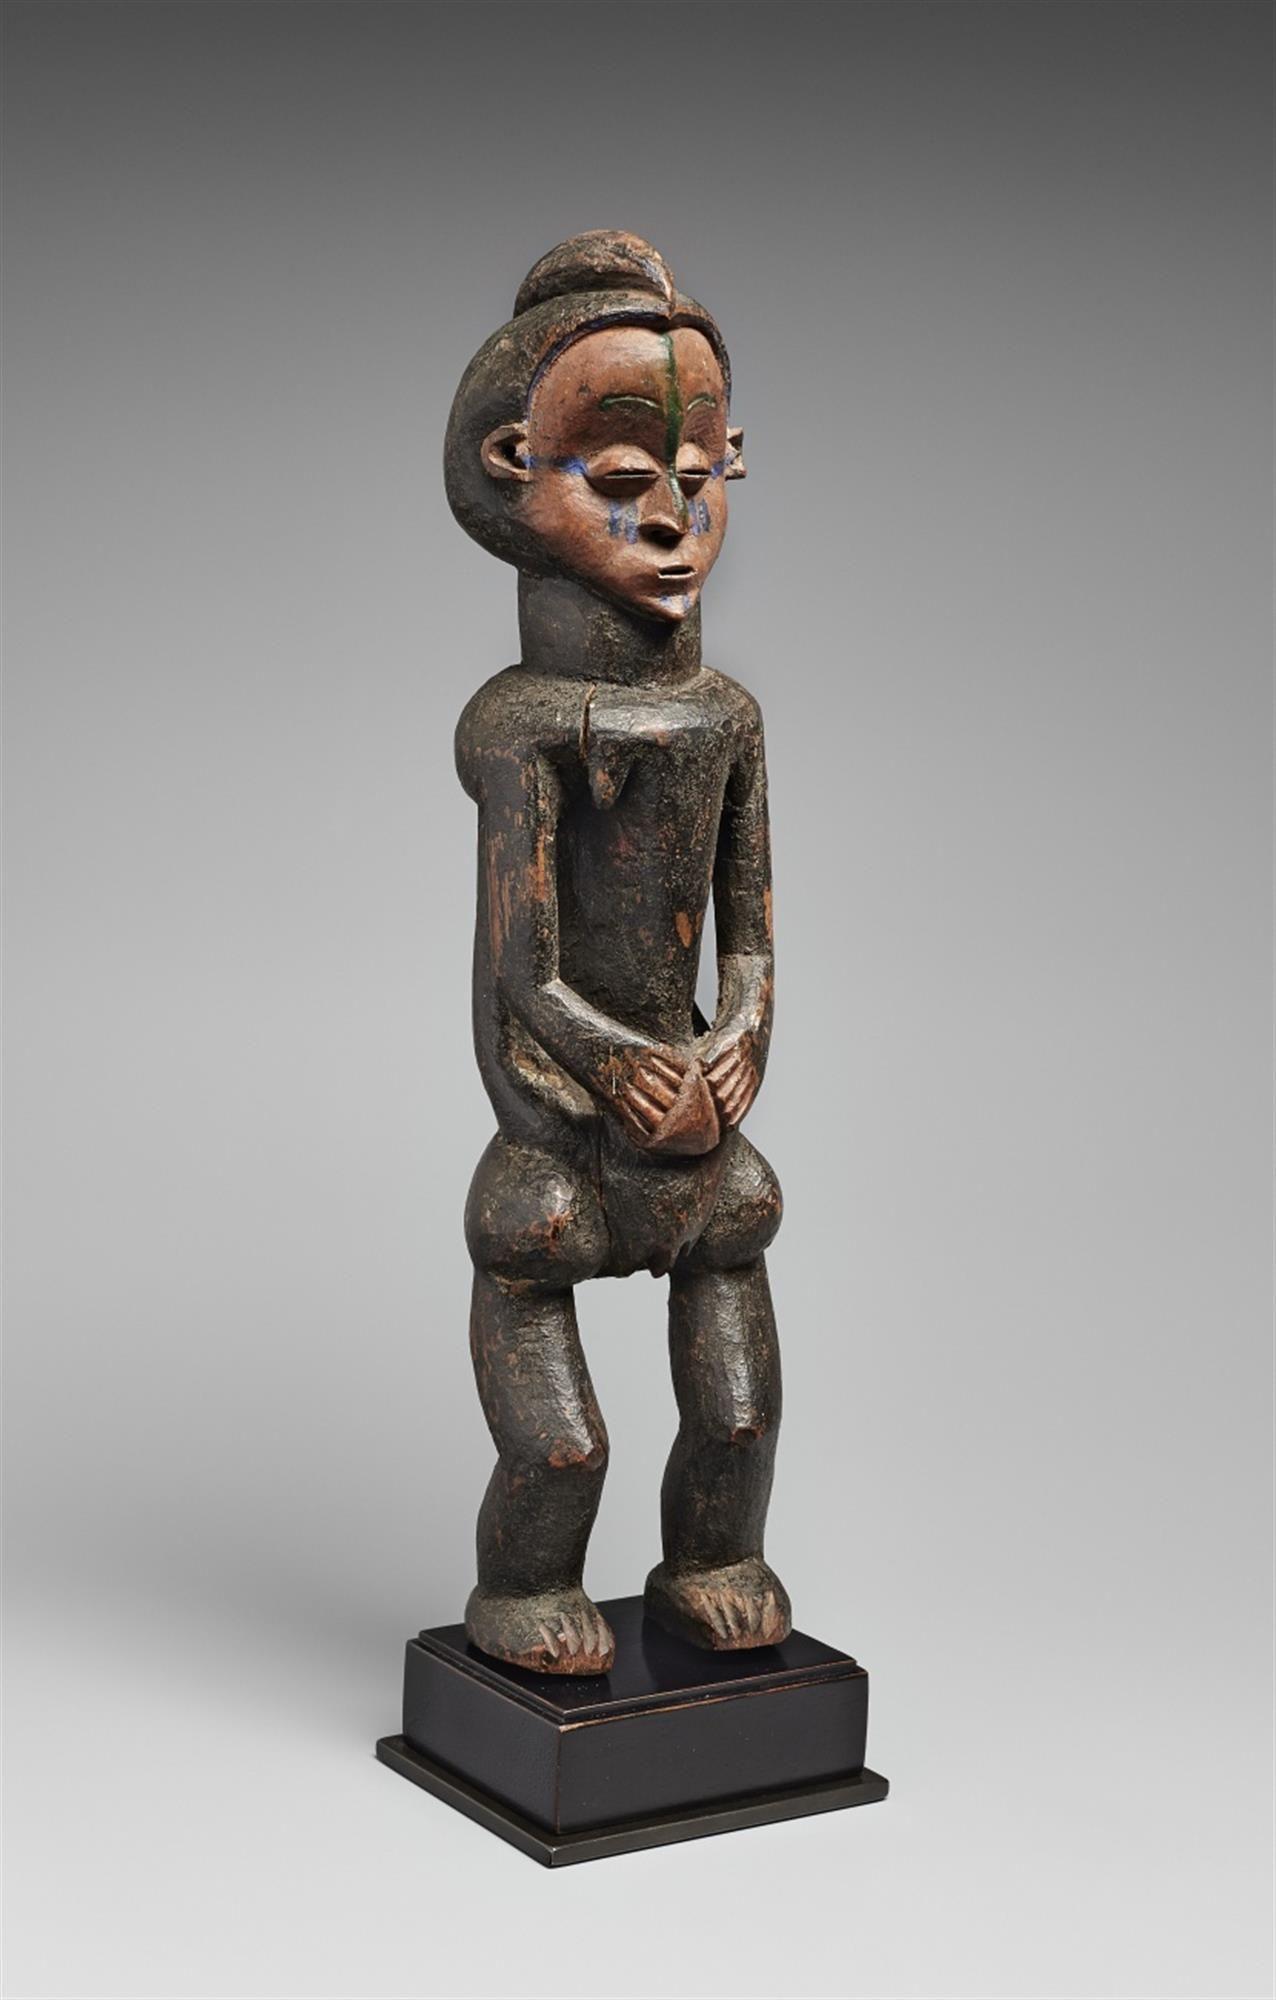 Democratic Republic of the Congo, A SUKU/HOLO FEMALE FIGURE #suku #holo #female #figure #sculpture #african #congo #lempertz #art #artauction